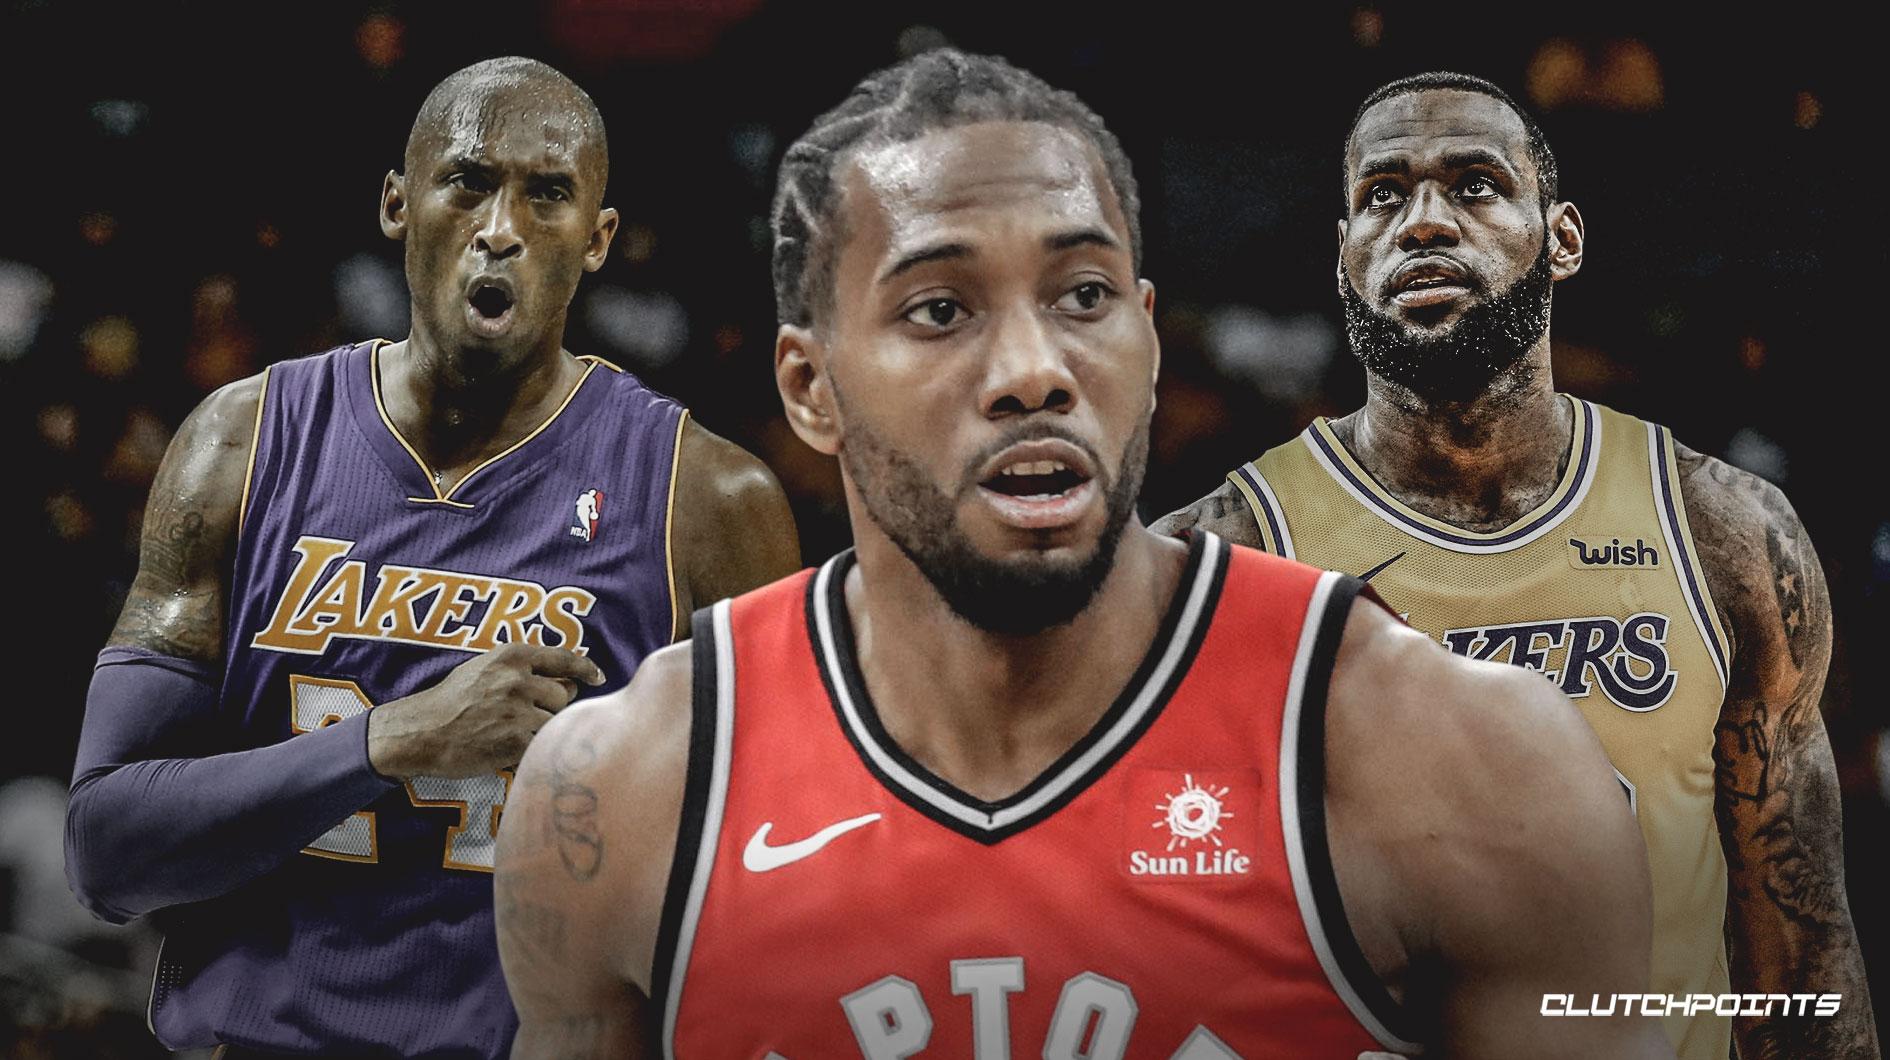 Kawhi Leonard cân bằng kỷ lục với Kobe Bryant và LeBron James tại NBA Playoffs